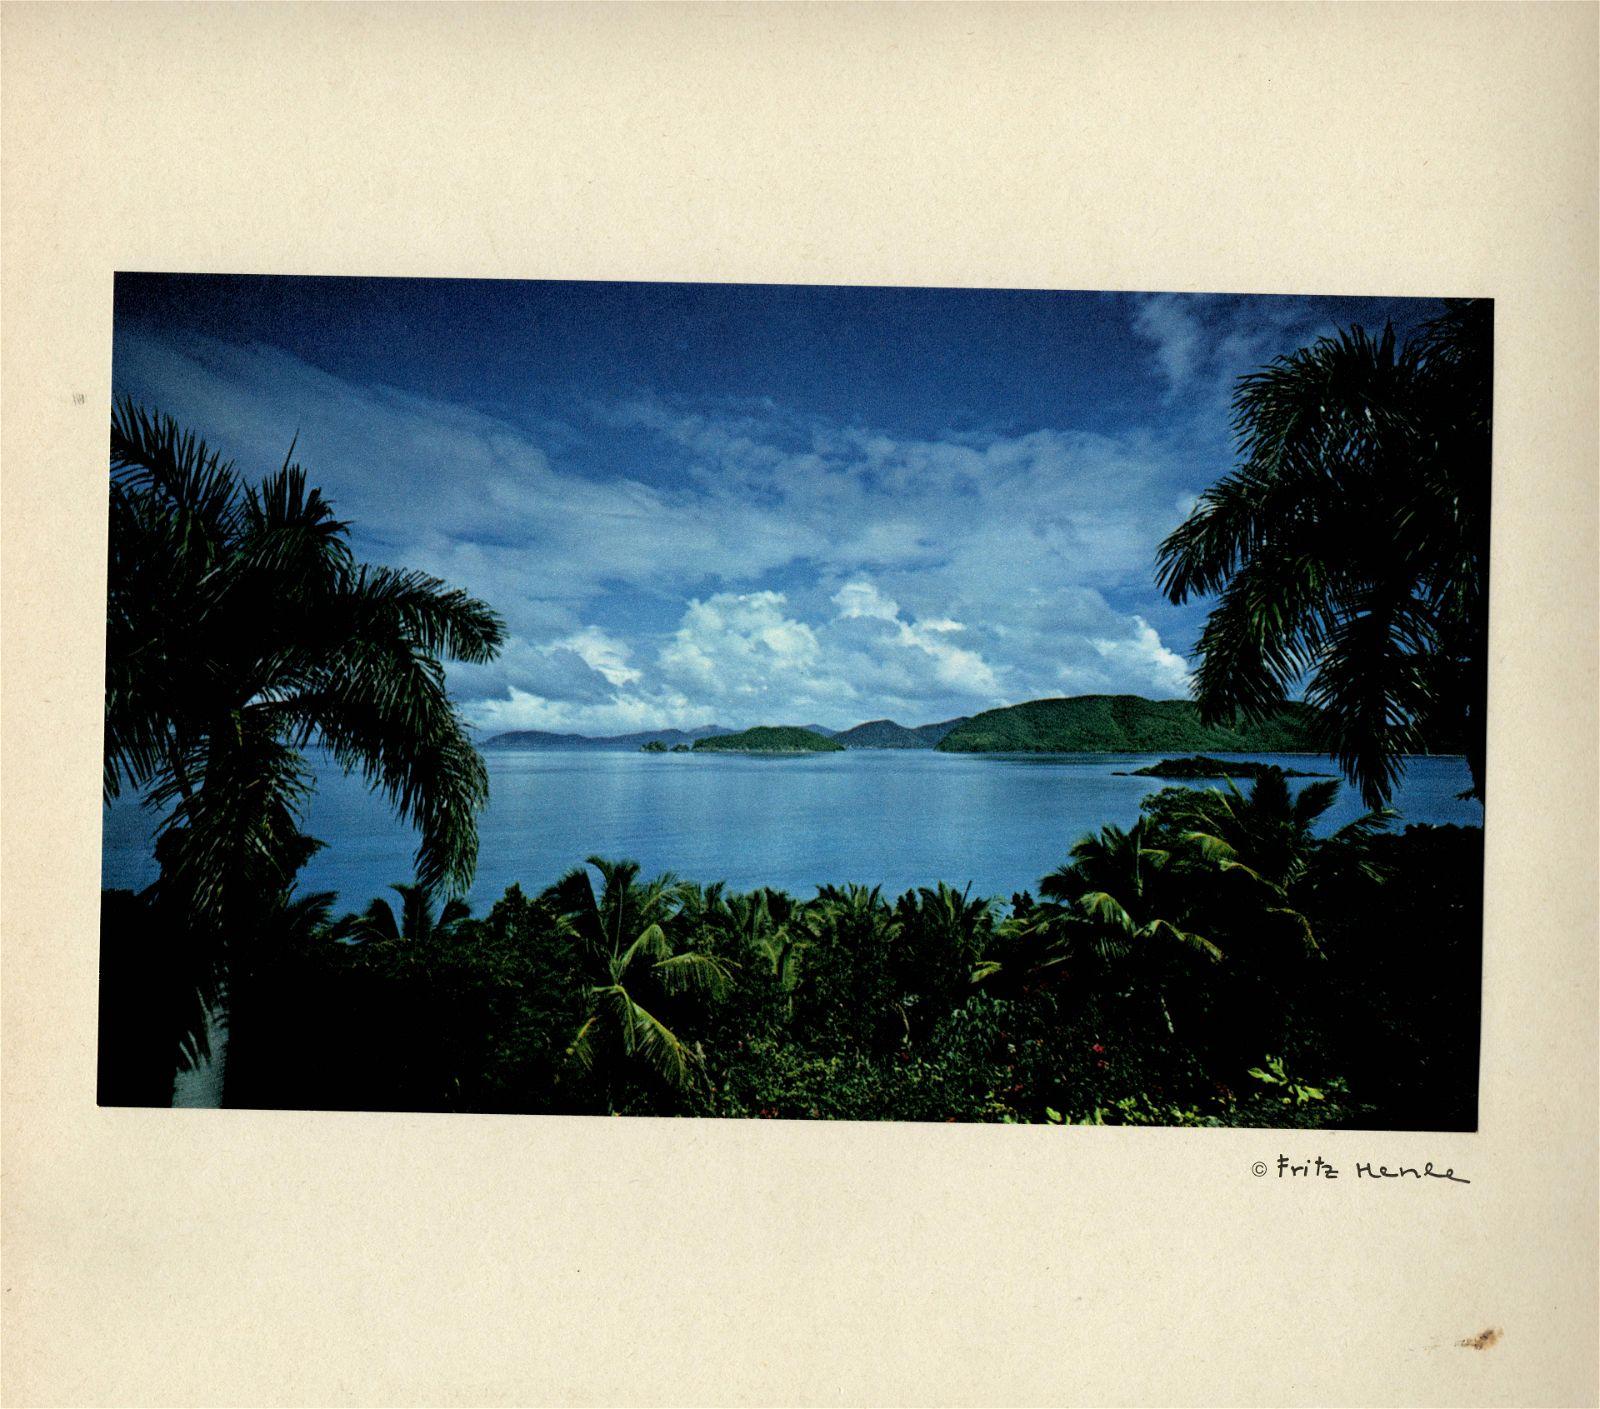 1971 Fritz Henle Fine Prints